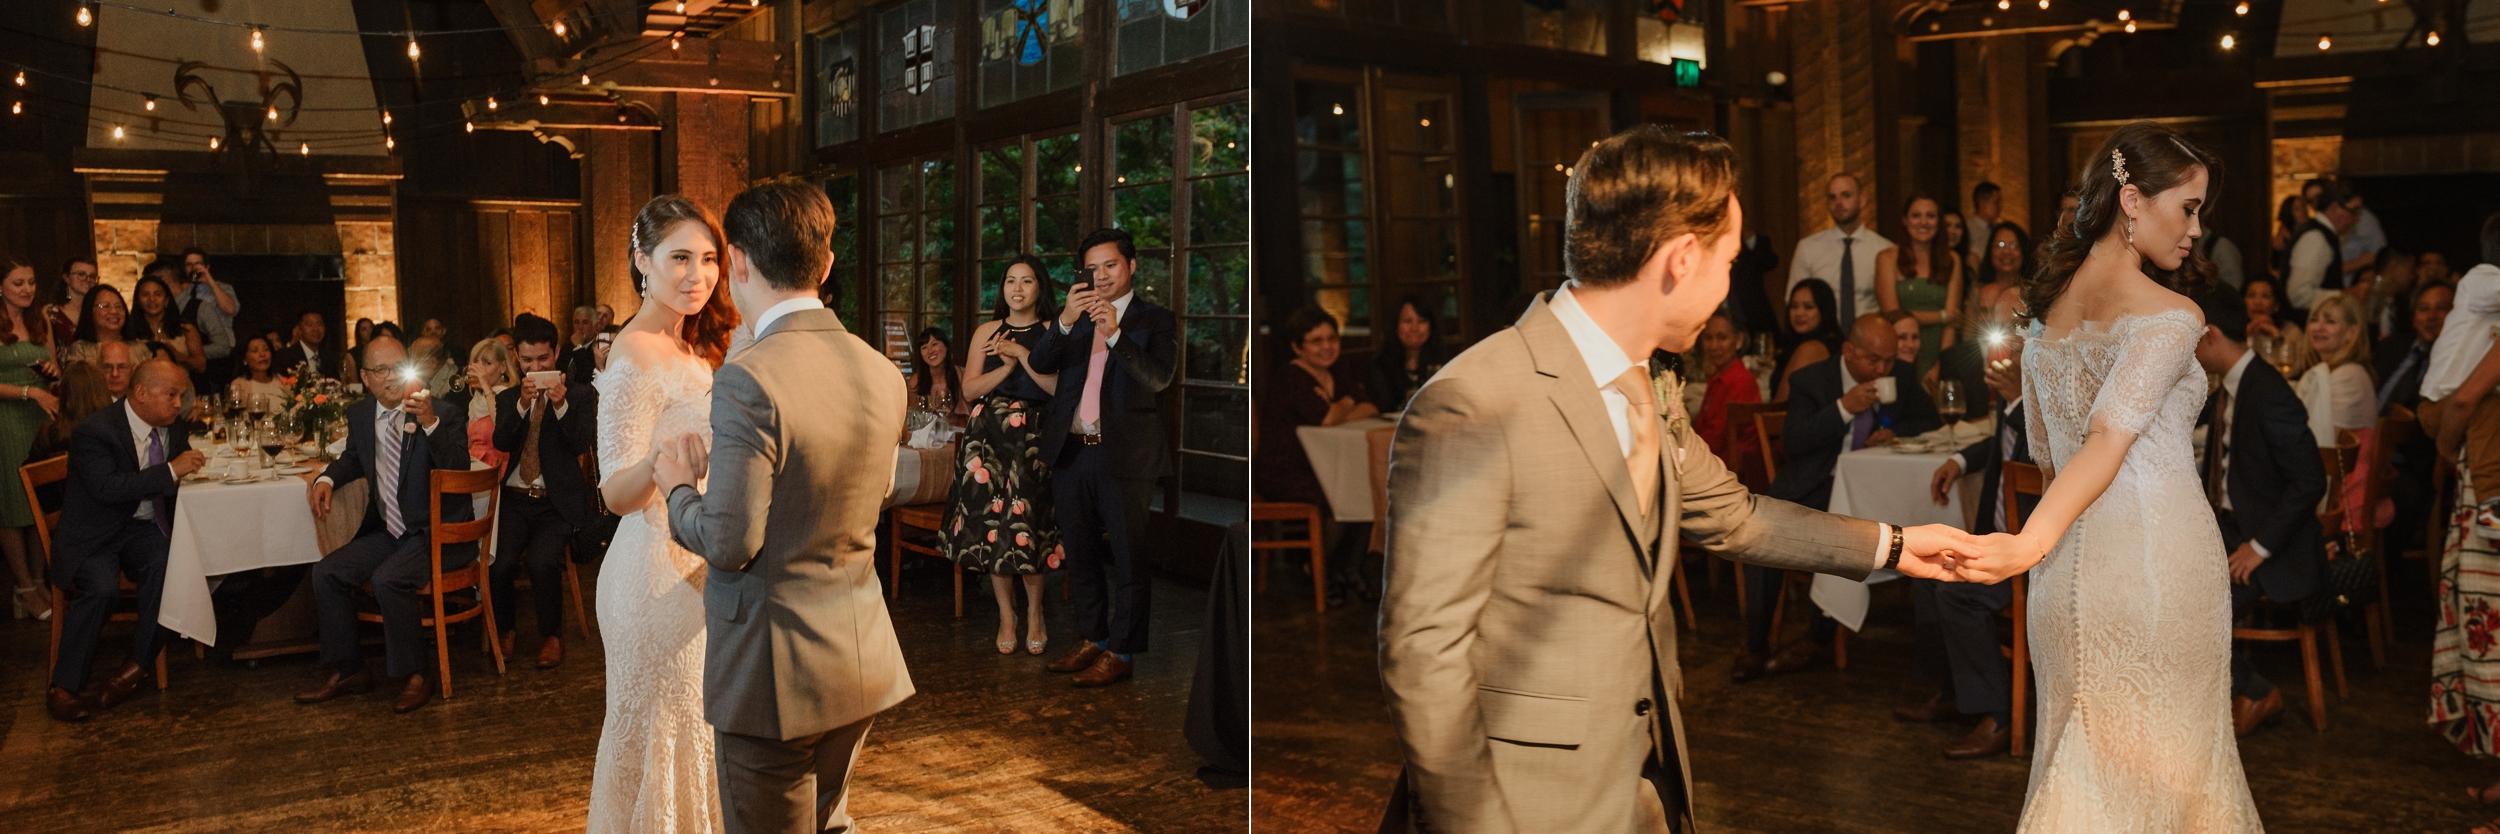 71-berkeley-uc-faculty-club-wedding-kb-vivianchen-449_WEB.jpg